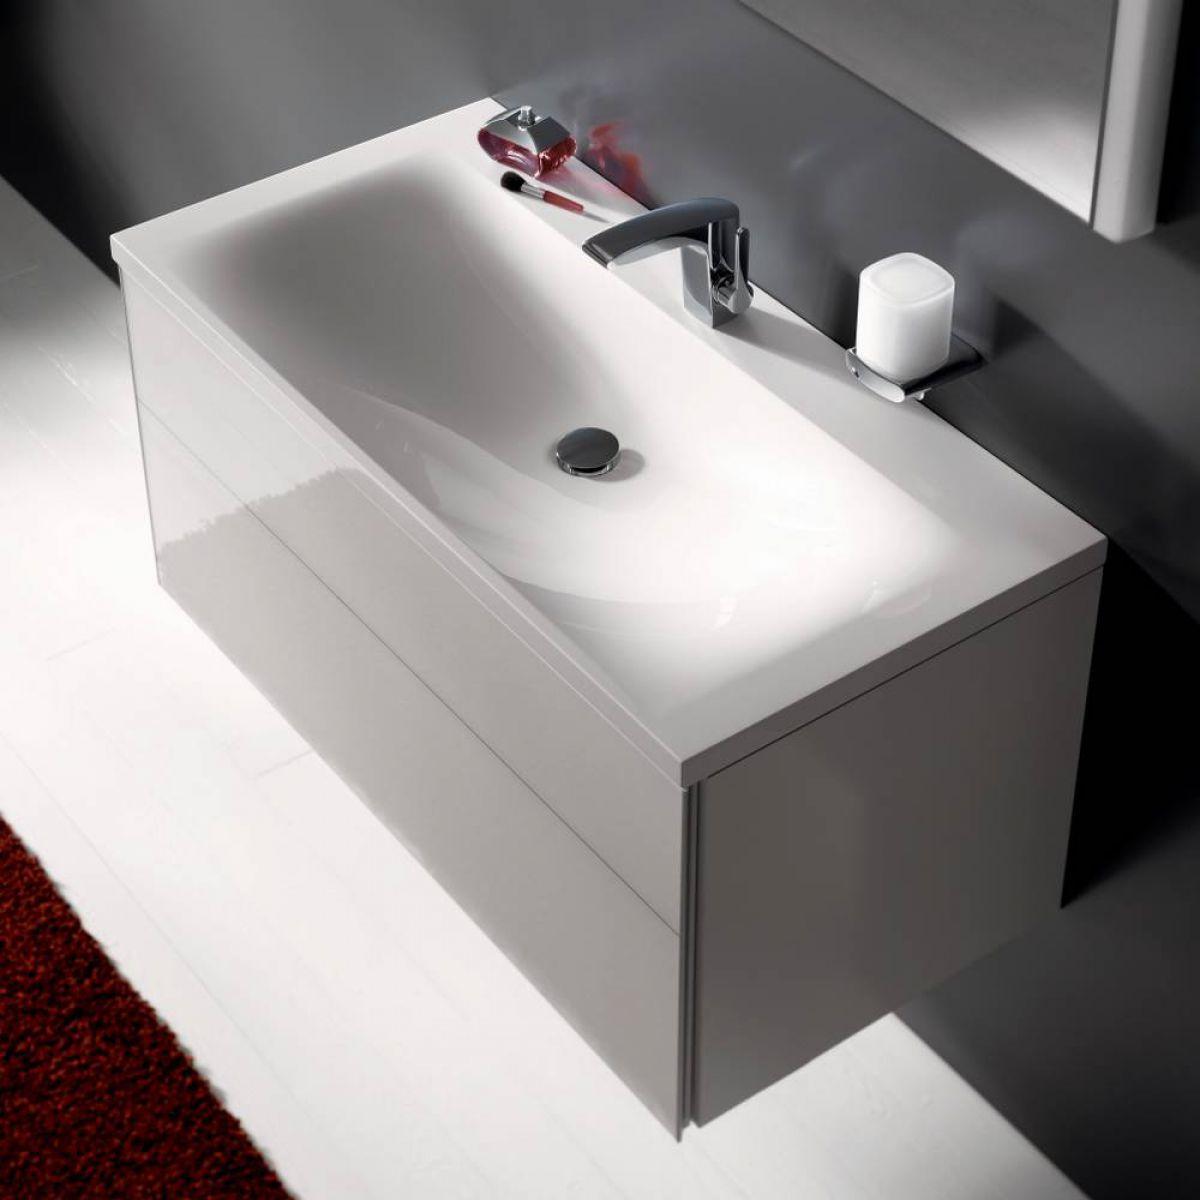 keuco royal reflex washbasin vanity unit with basin uk bathrooms. Black Bedroom Furniture Sets. Home Design Ideas